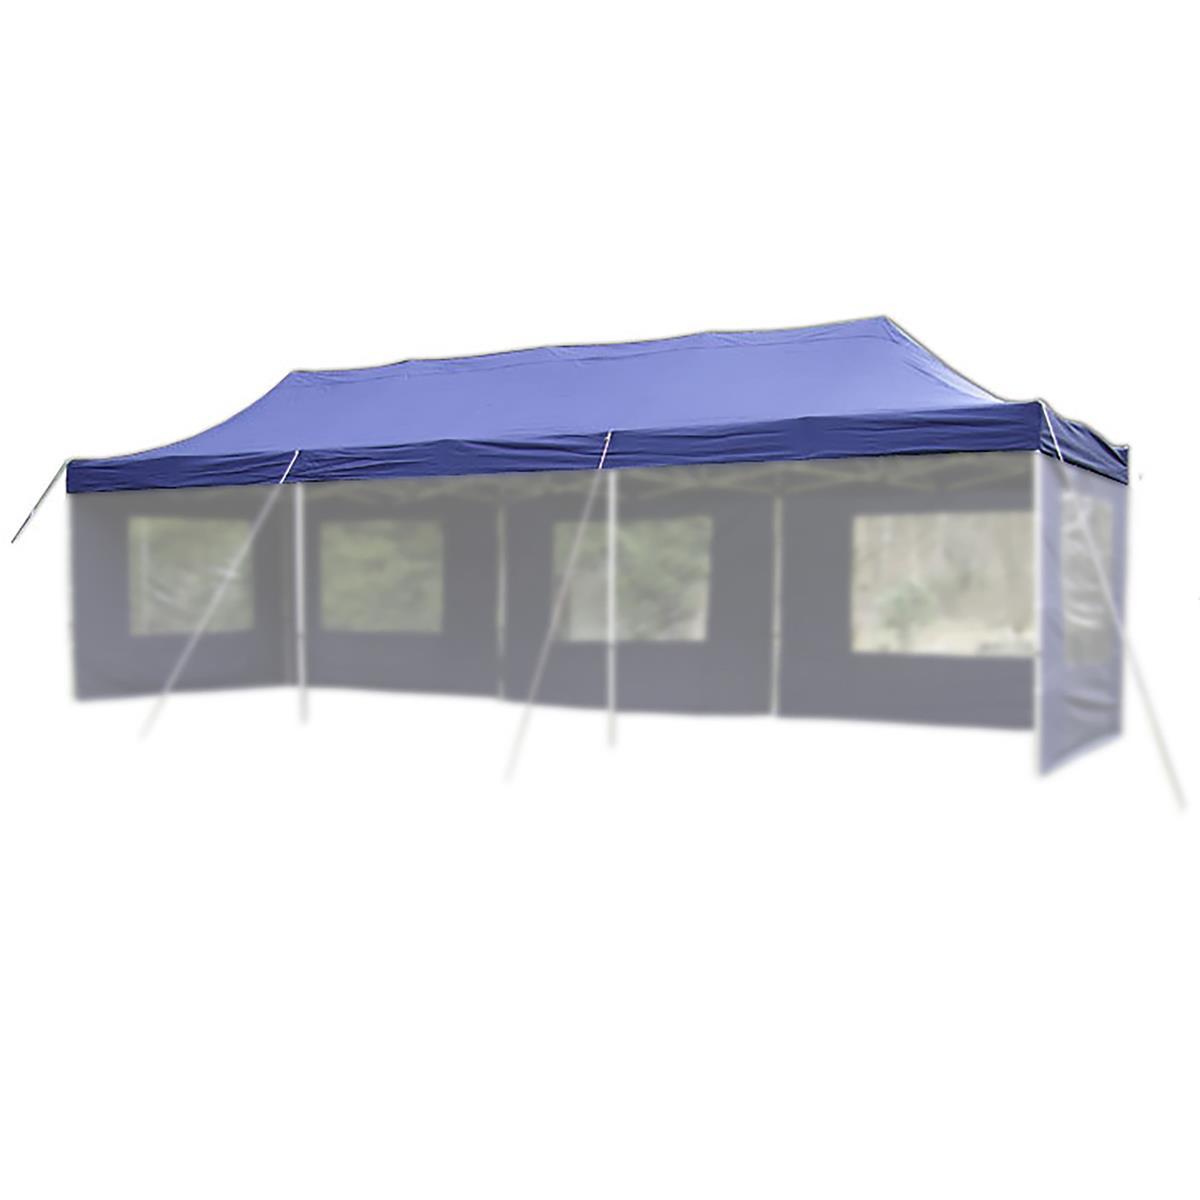 Ersatzdach für PROFI Falt Pavillon 3x9m blau wasserdicht Dachplane Pavillondach